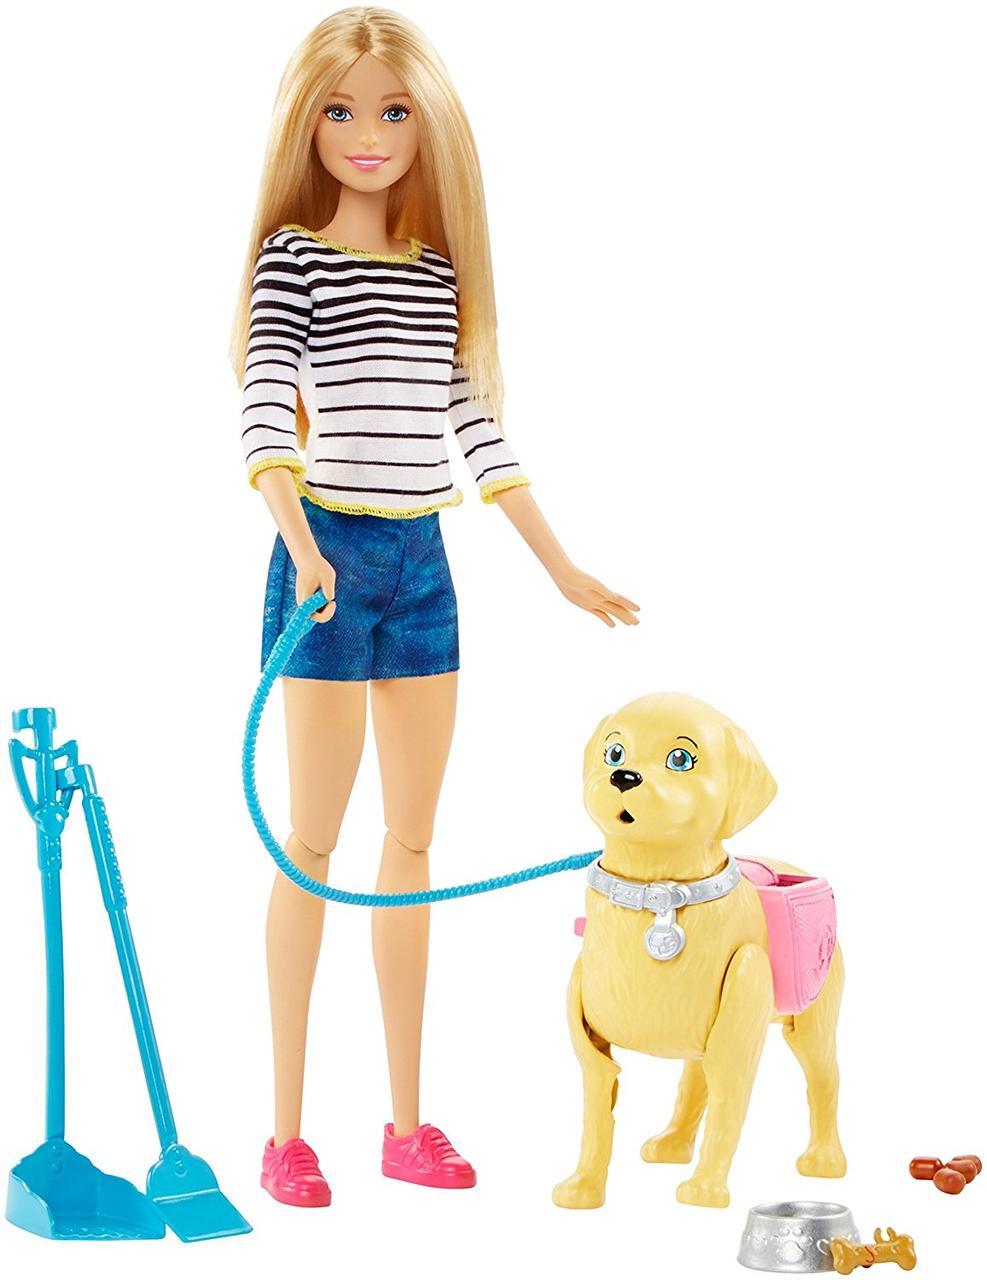 Кукла Барби с собакой Уход за питомцем Barbie Girls Walk and Potty Pup with Blonde Doll